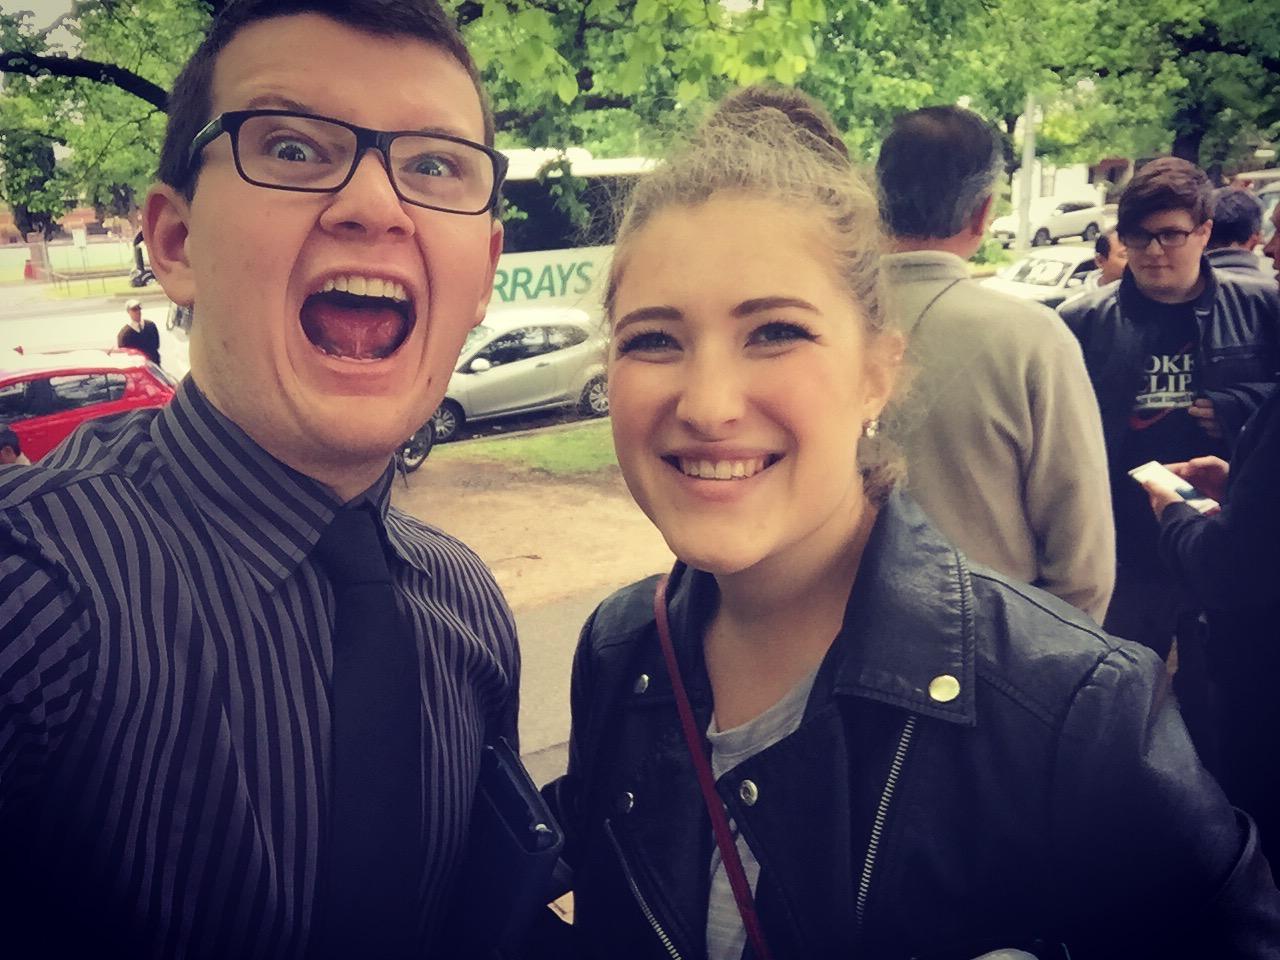 Post-exam selfie with my Girlfriend, Chloe. Image:© Jasen Scott, 2016.